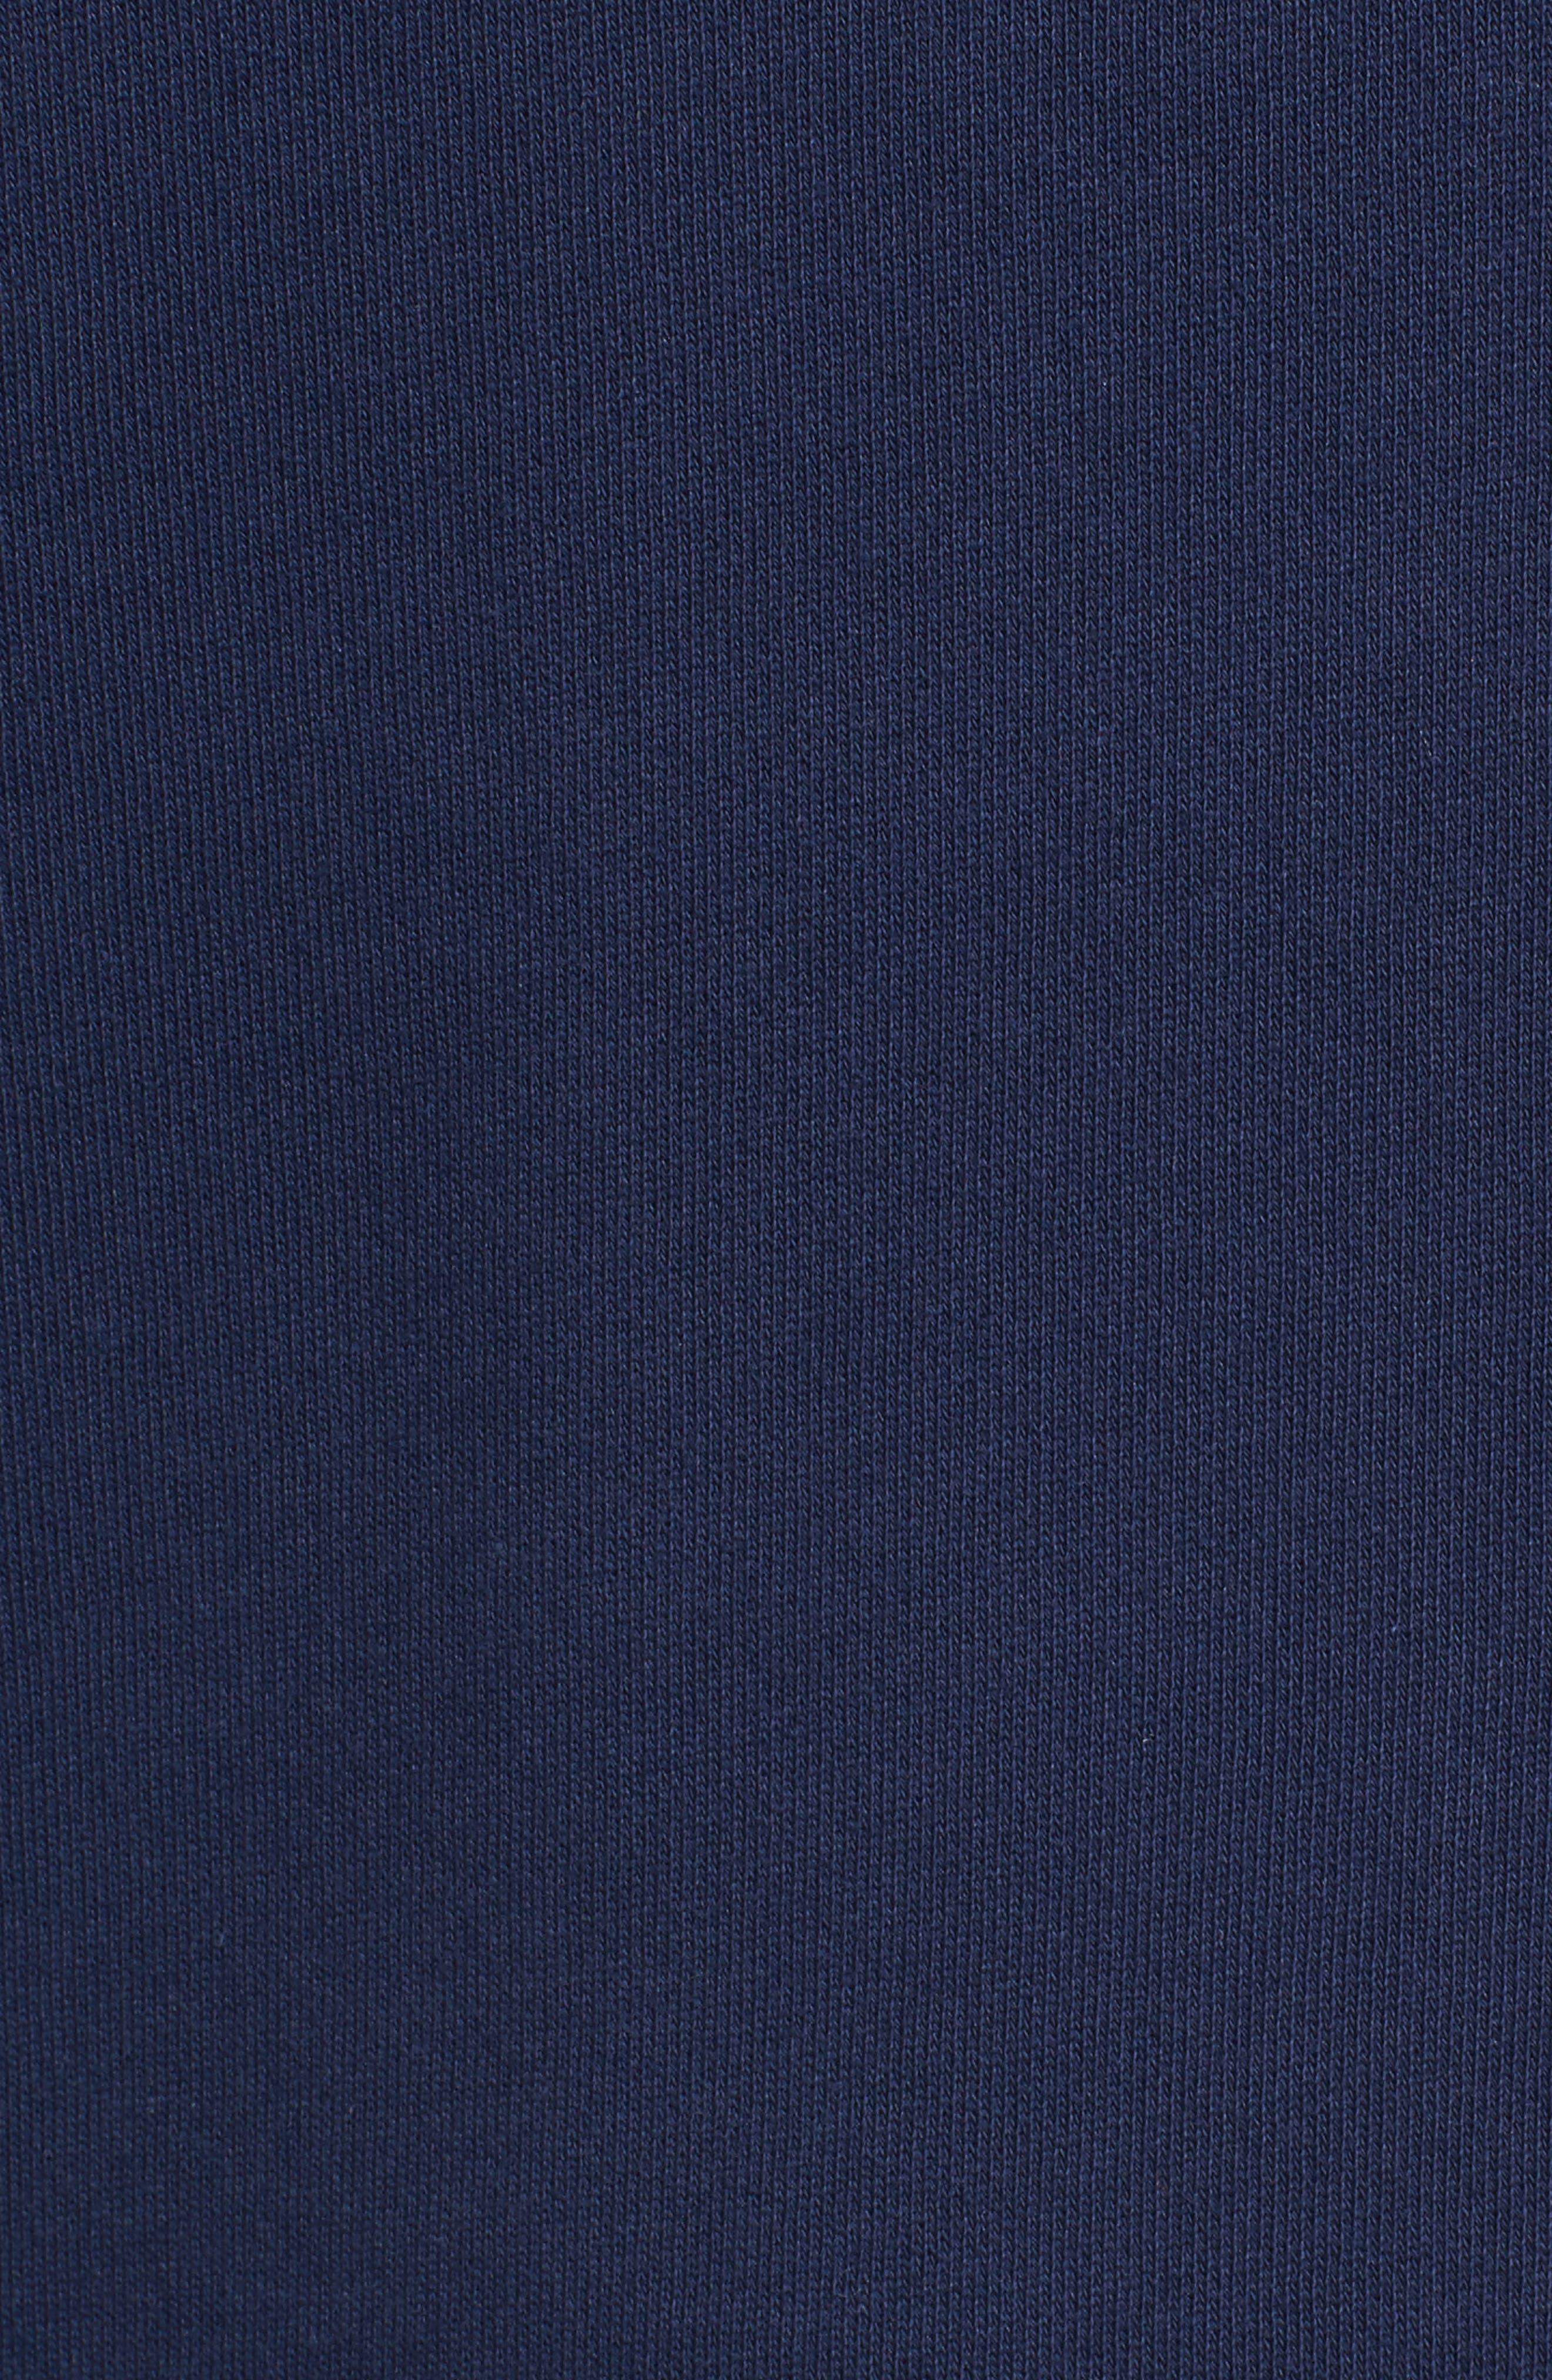 Honey Bun Sweatshirt,                             Alternate thumbnail 5, color,                             432